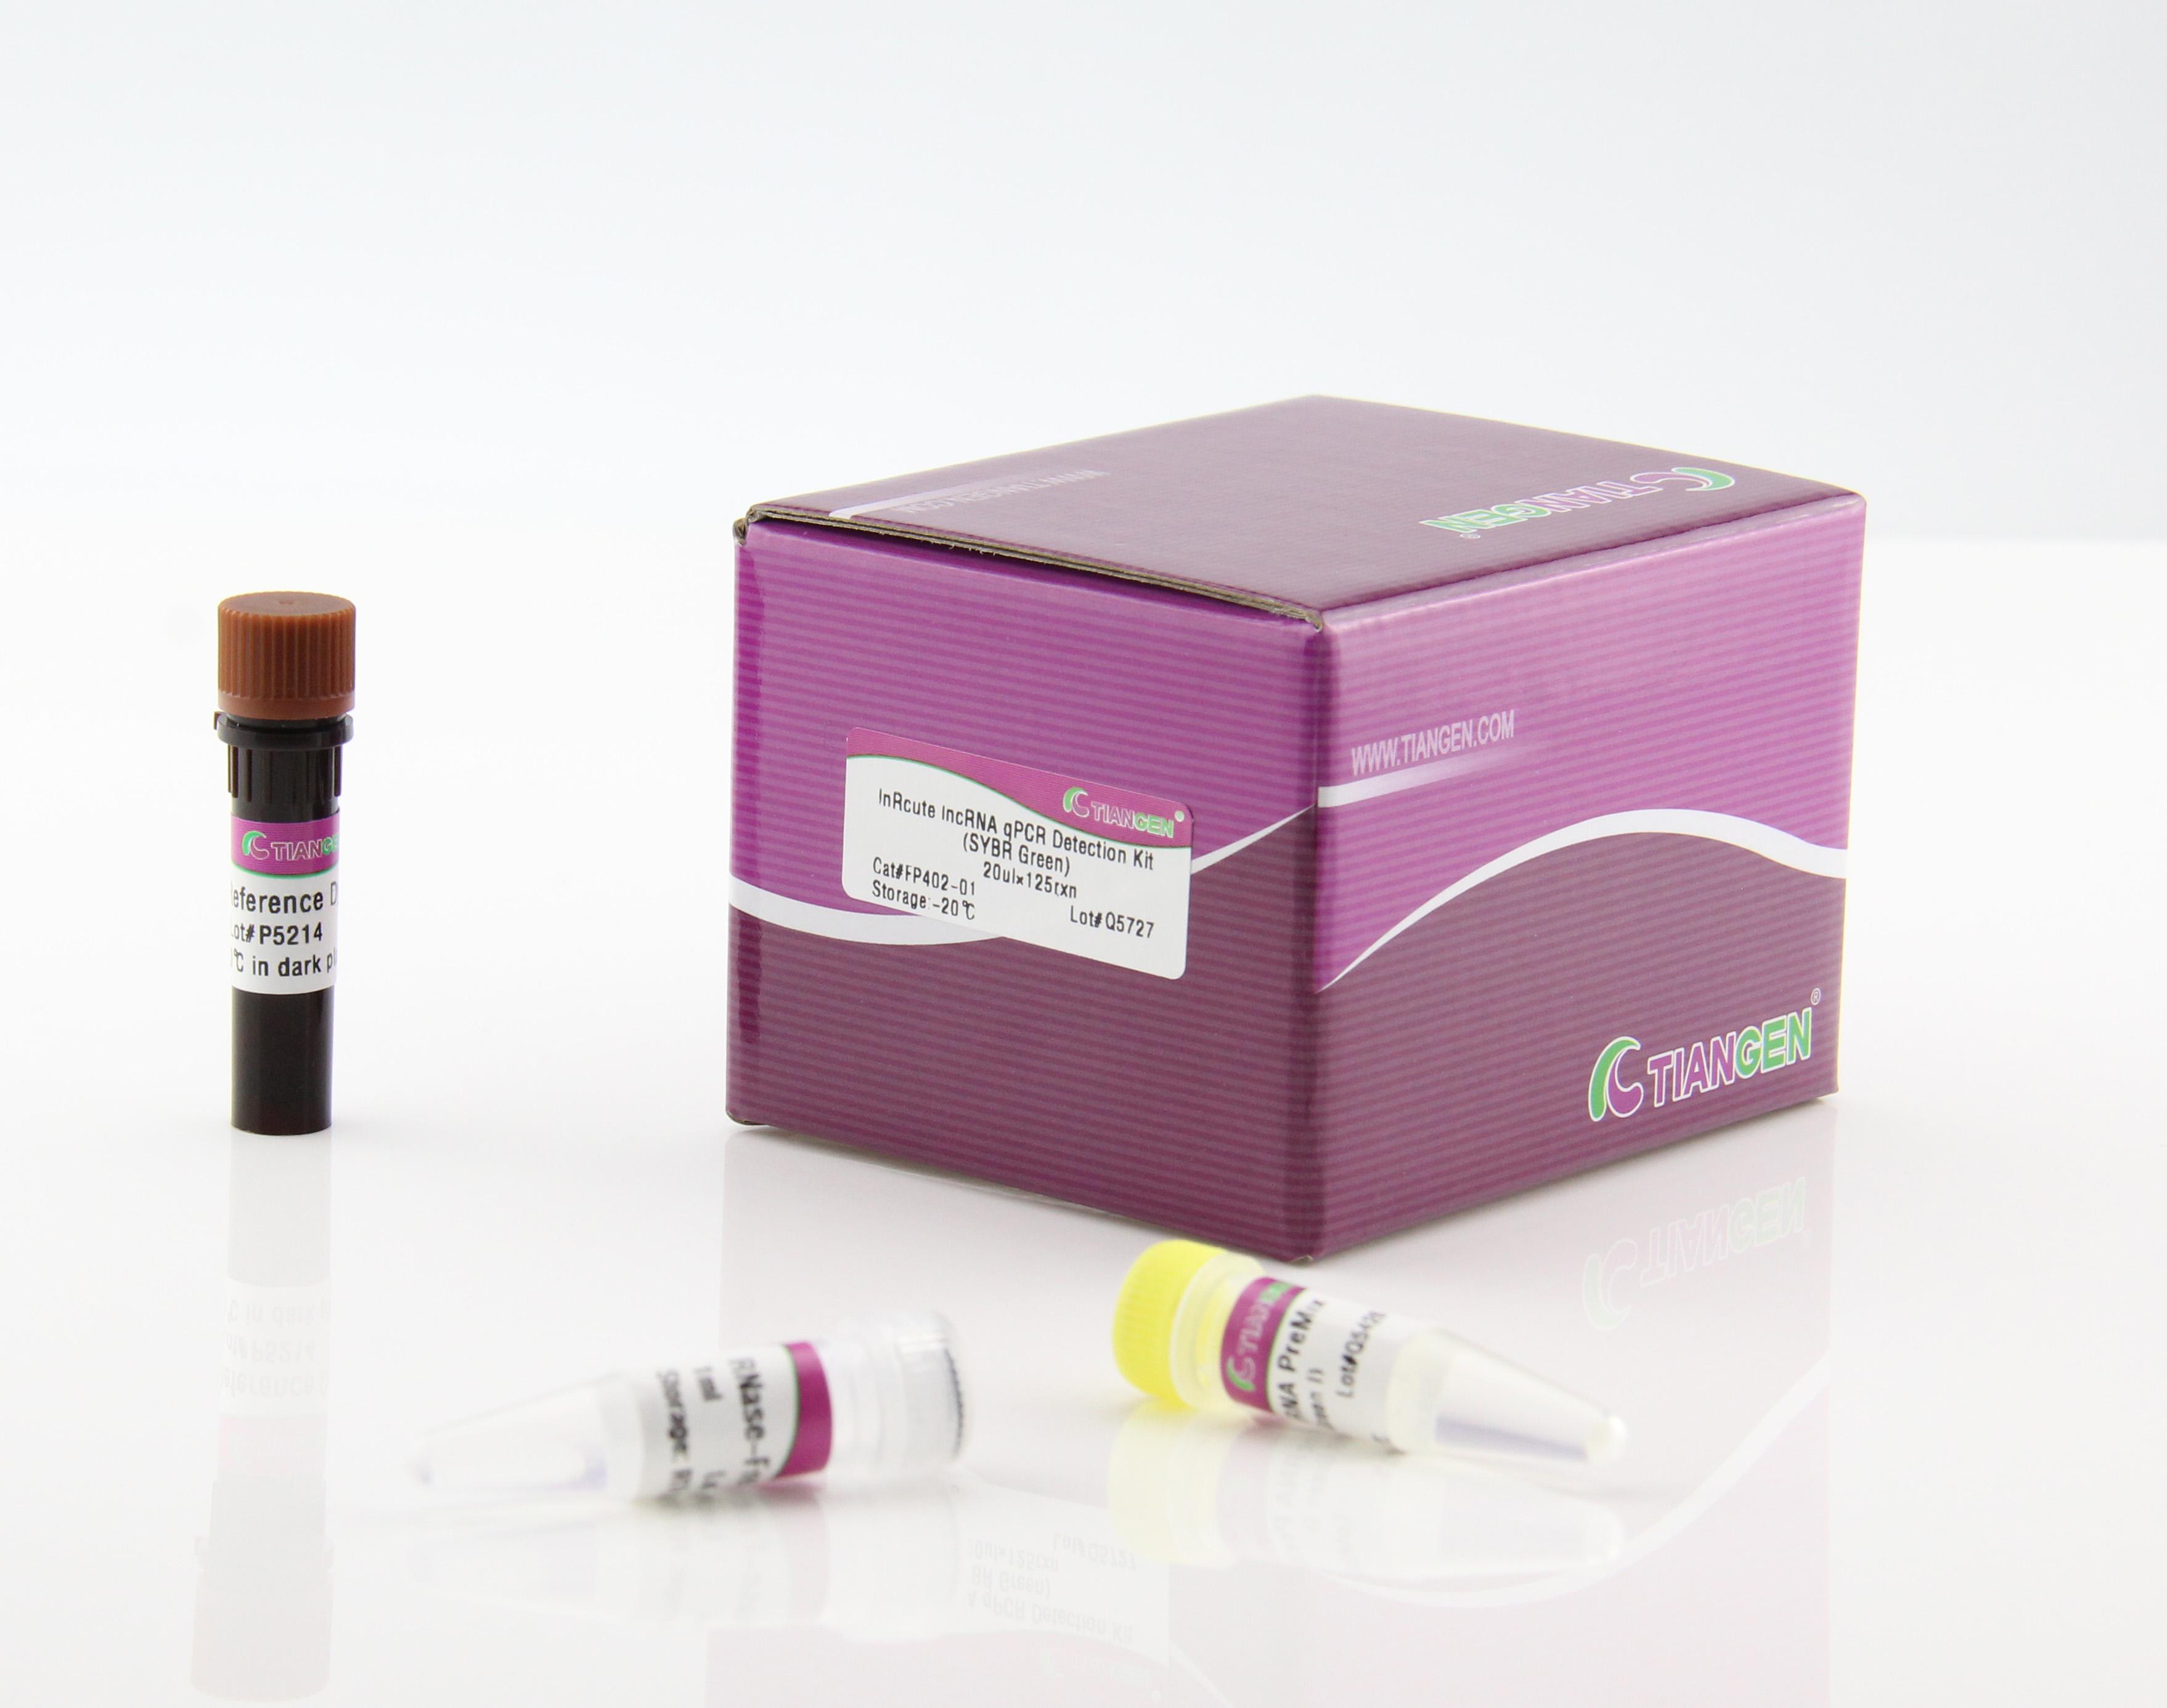 lnRcute lncRNA荧光定量检测试剂盒(SYBR Green) (FP402)